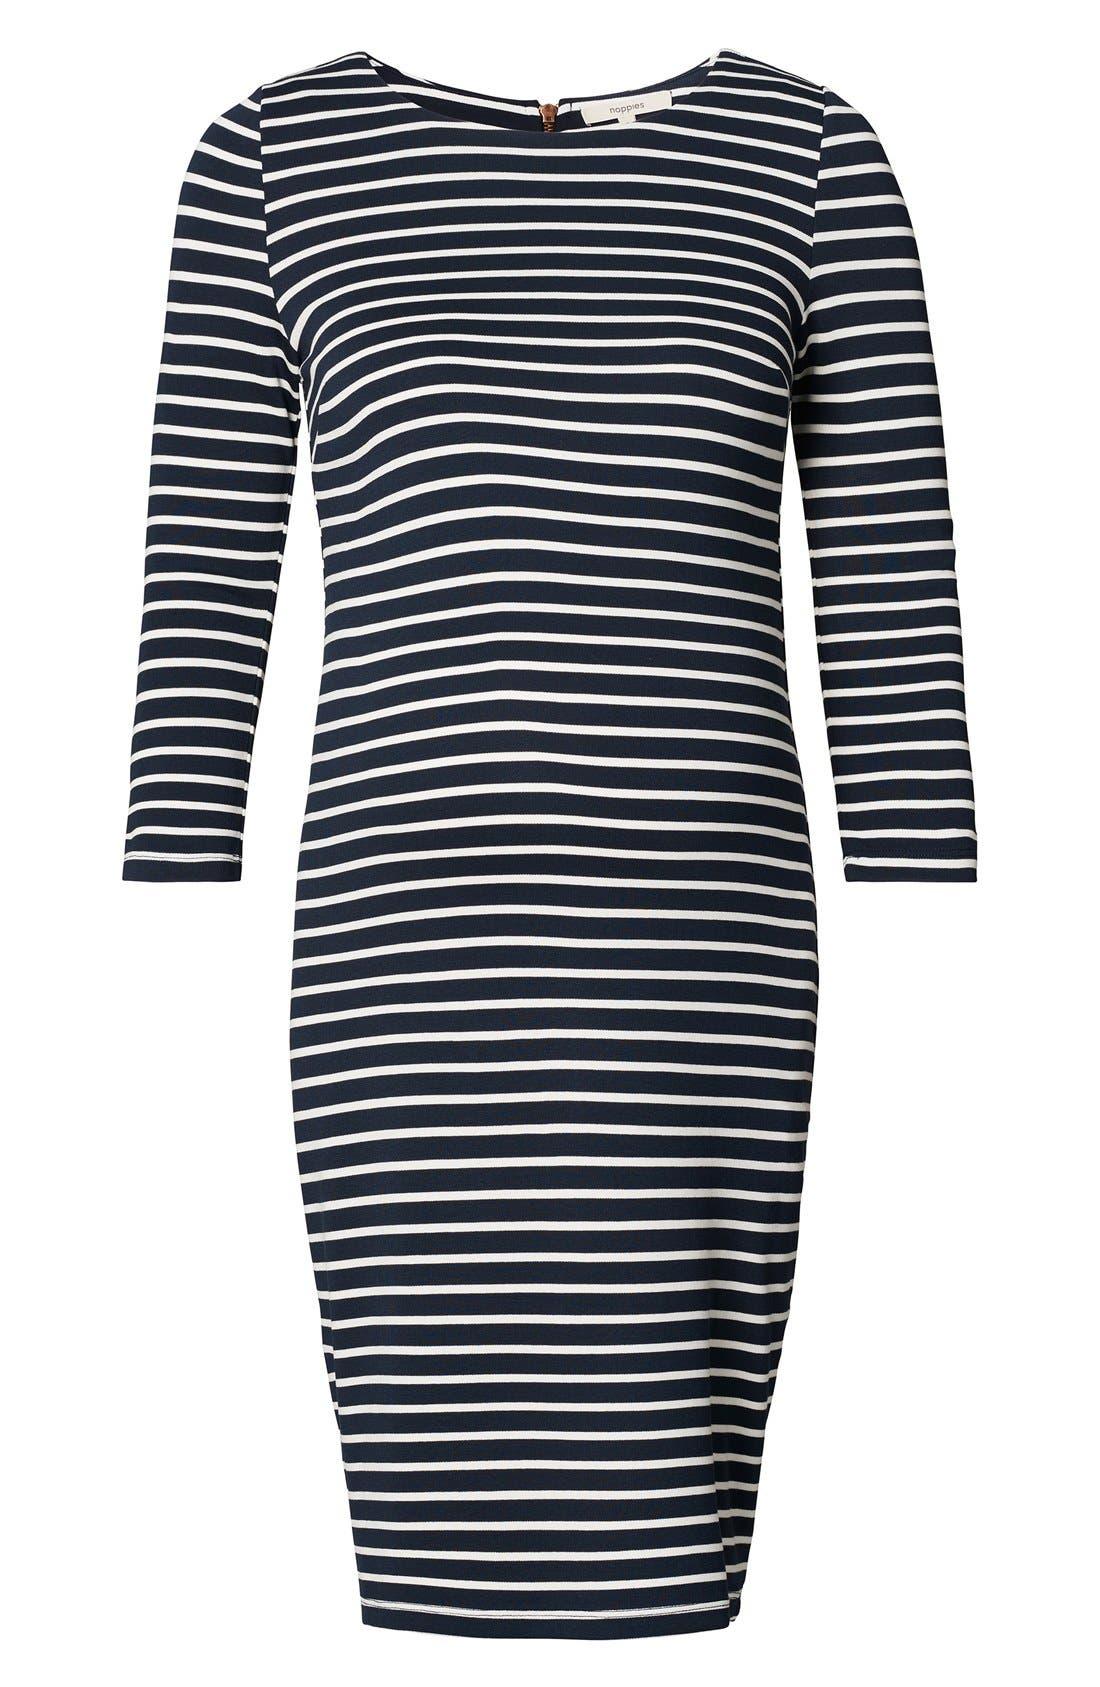 Main Image - Noppies Maternity Dress